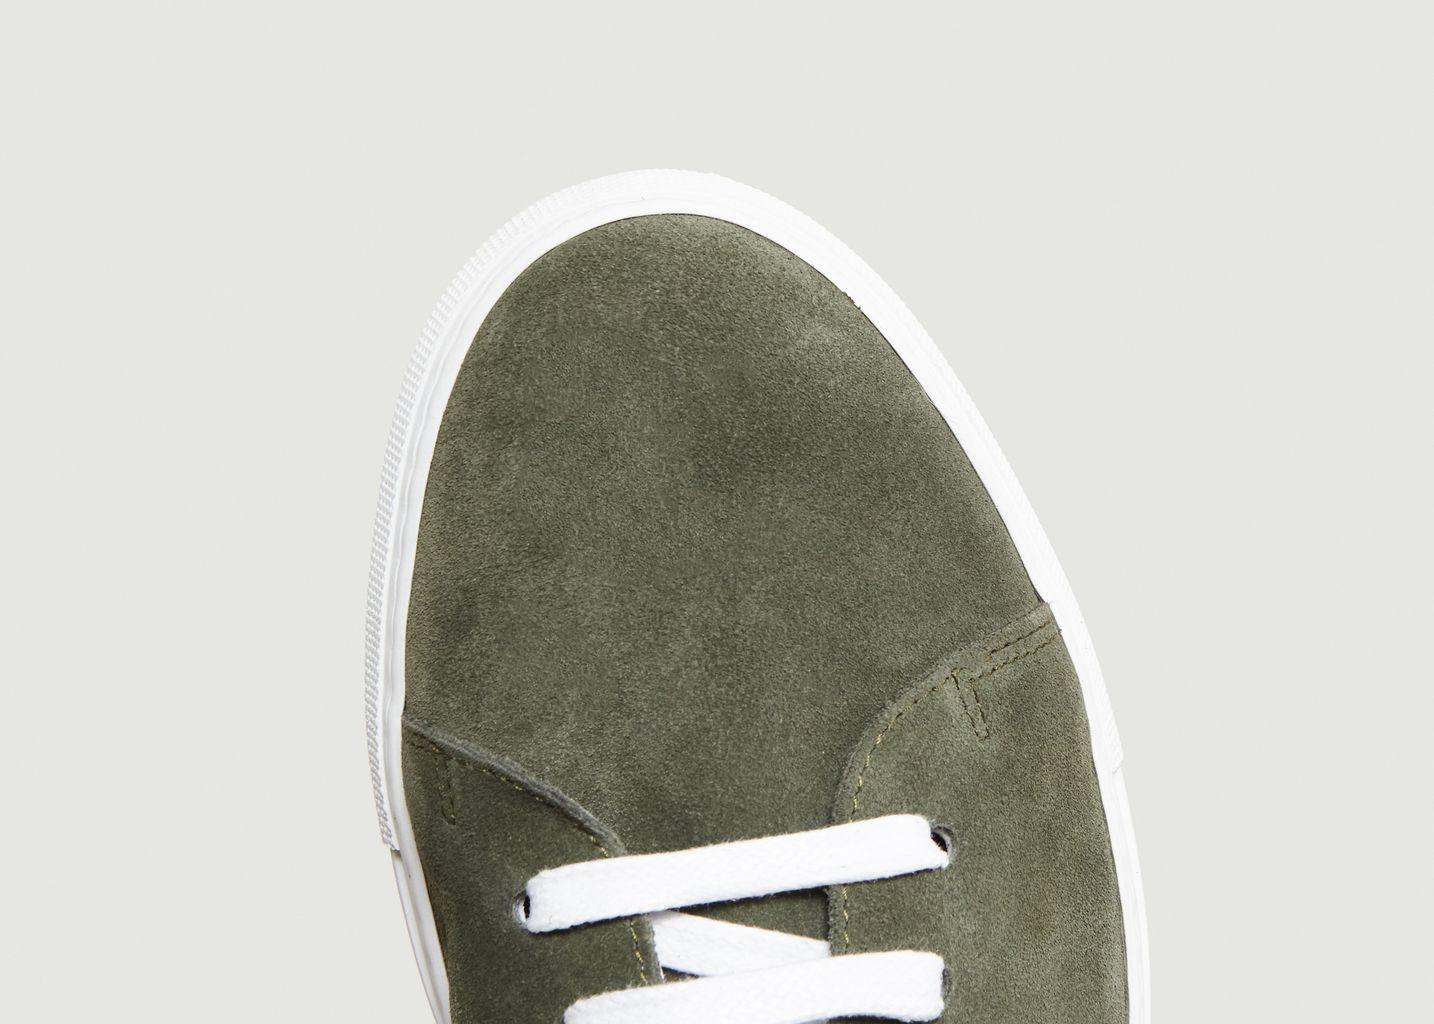 Sneakers Edition 3 en Suède - National Standard